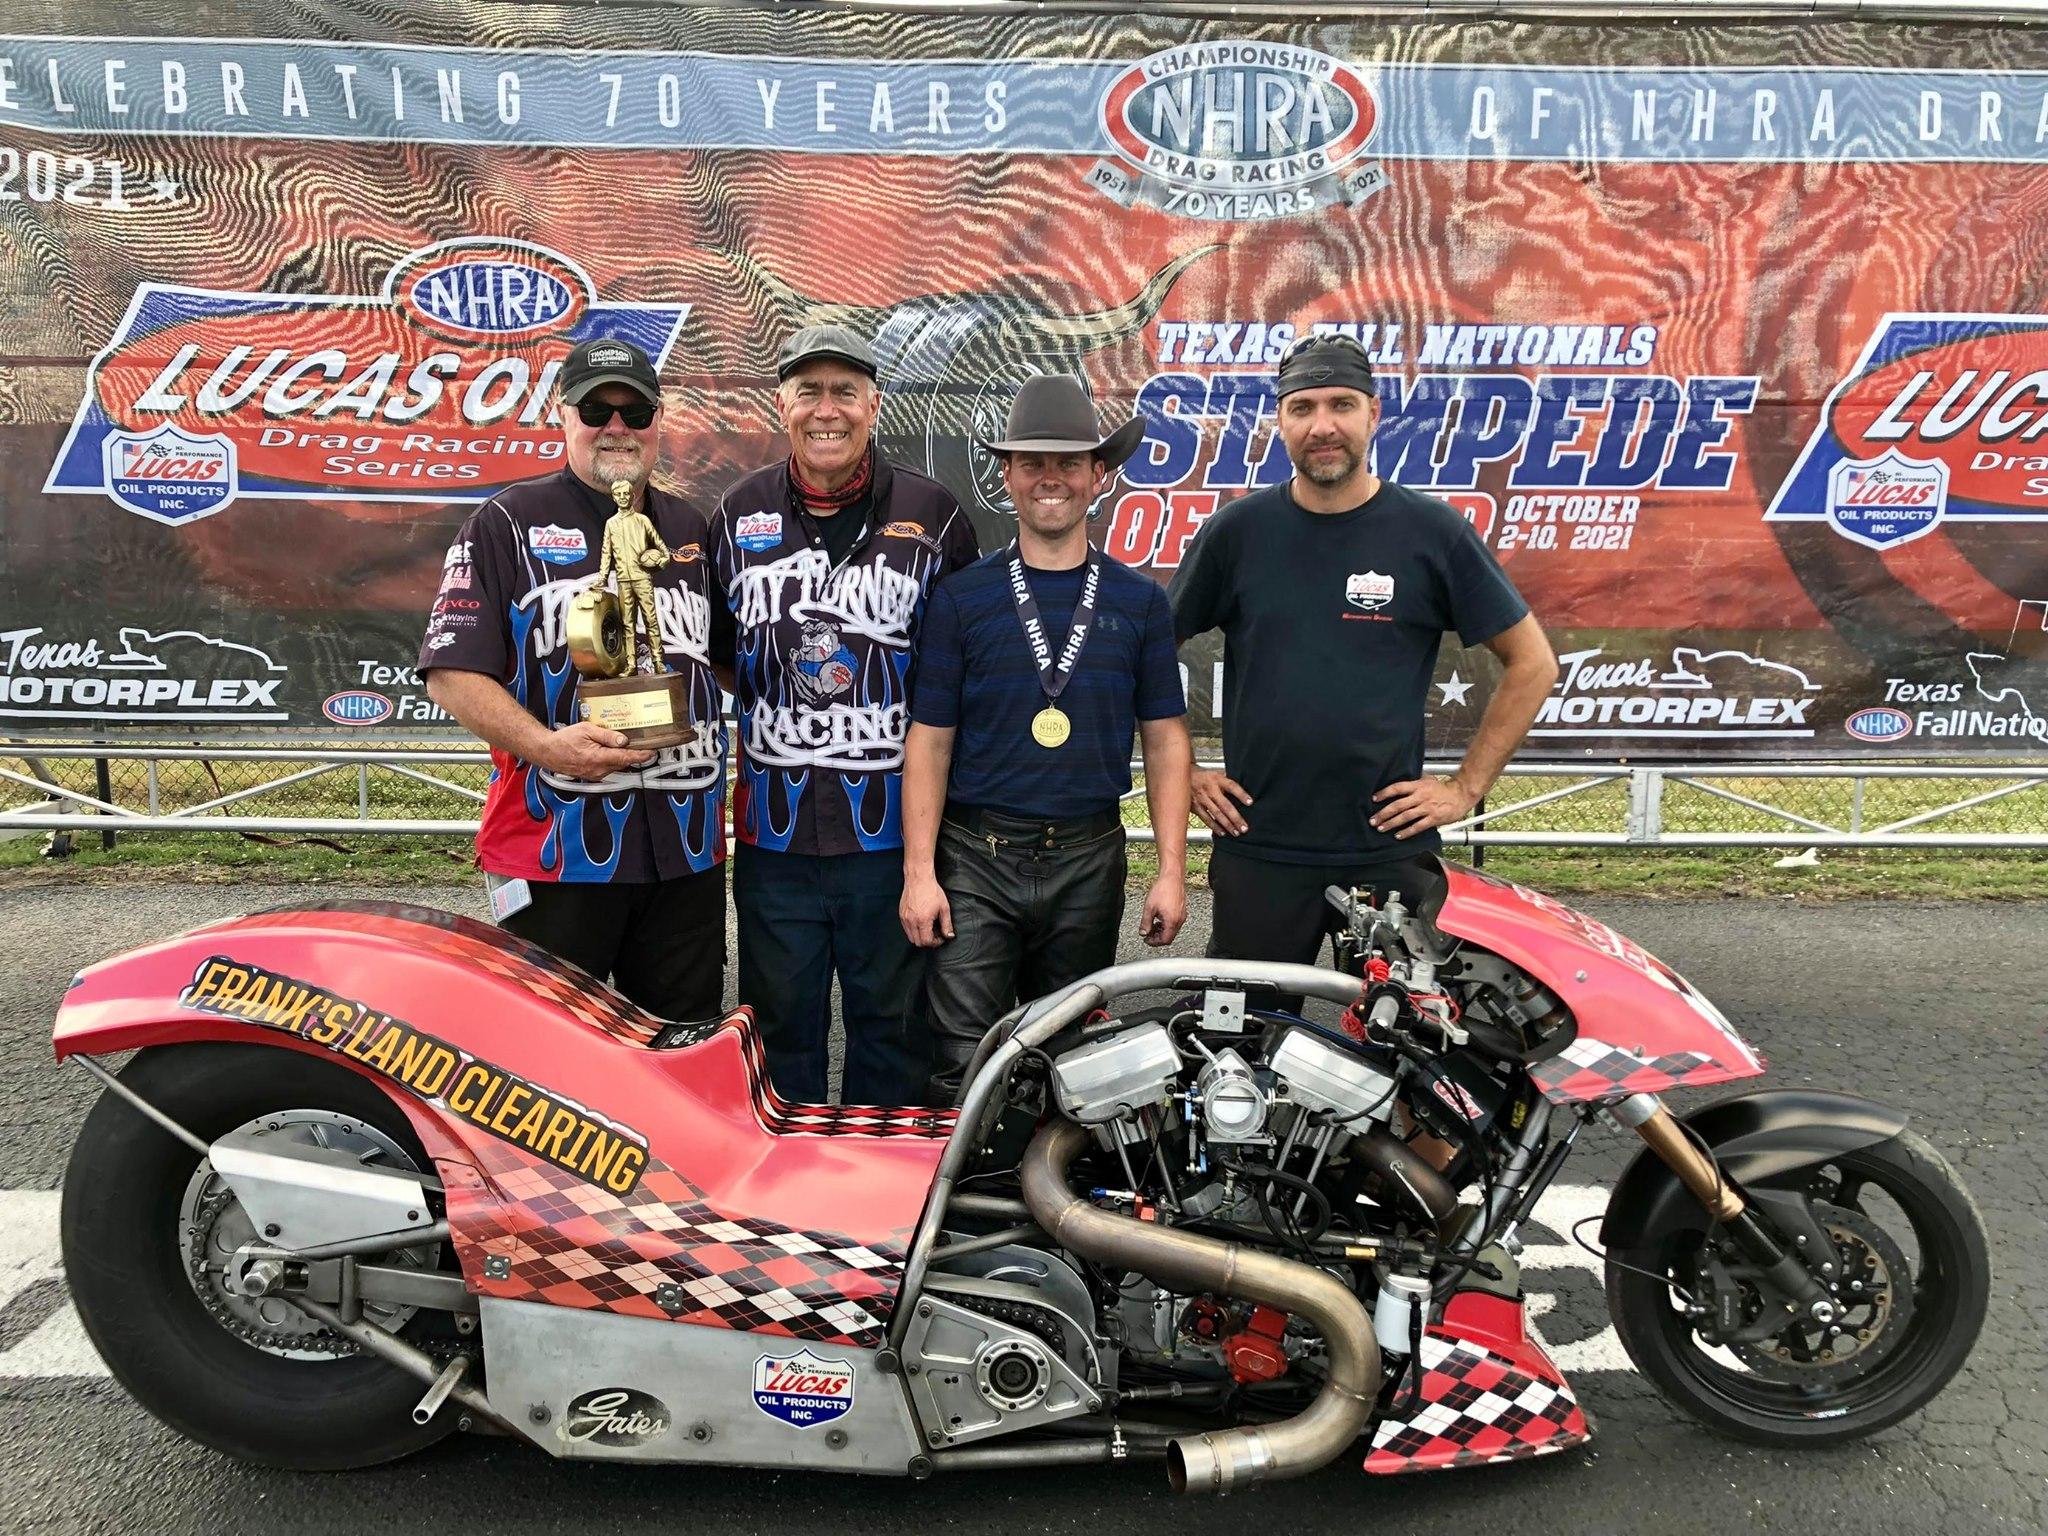 Chris Smith - Top Fuel Harley